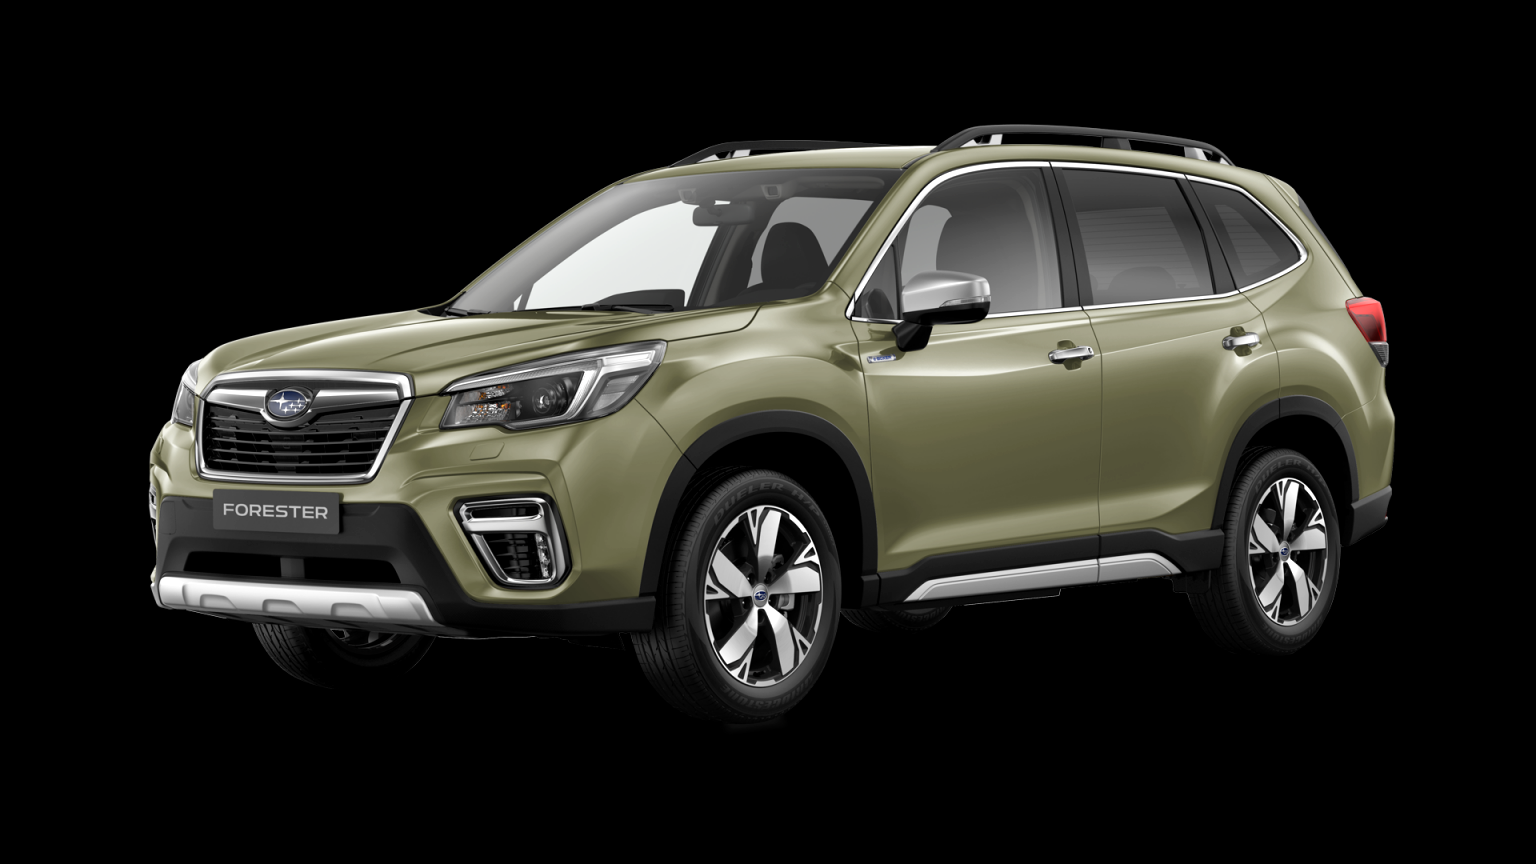 Subaru Outback 2021 Zero Percent Financing New Review In 2021 Subaru Outback Subaru Subaru Forester